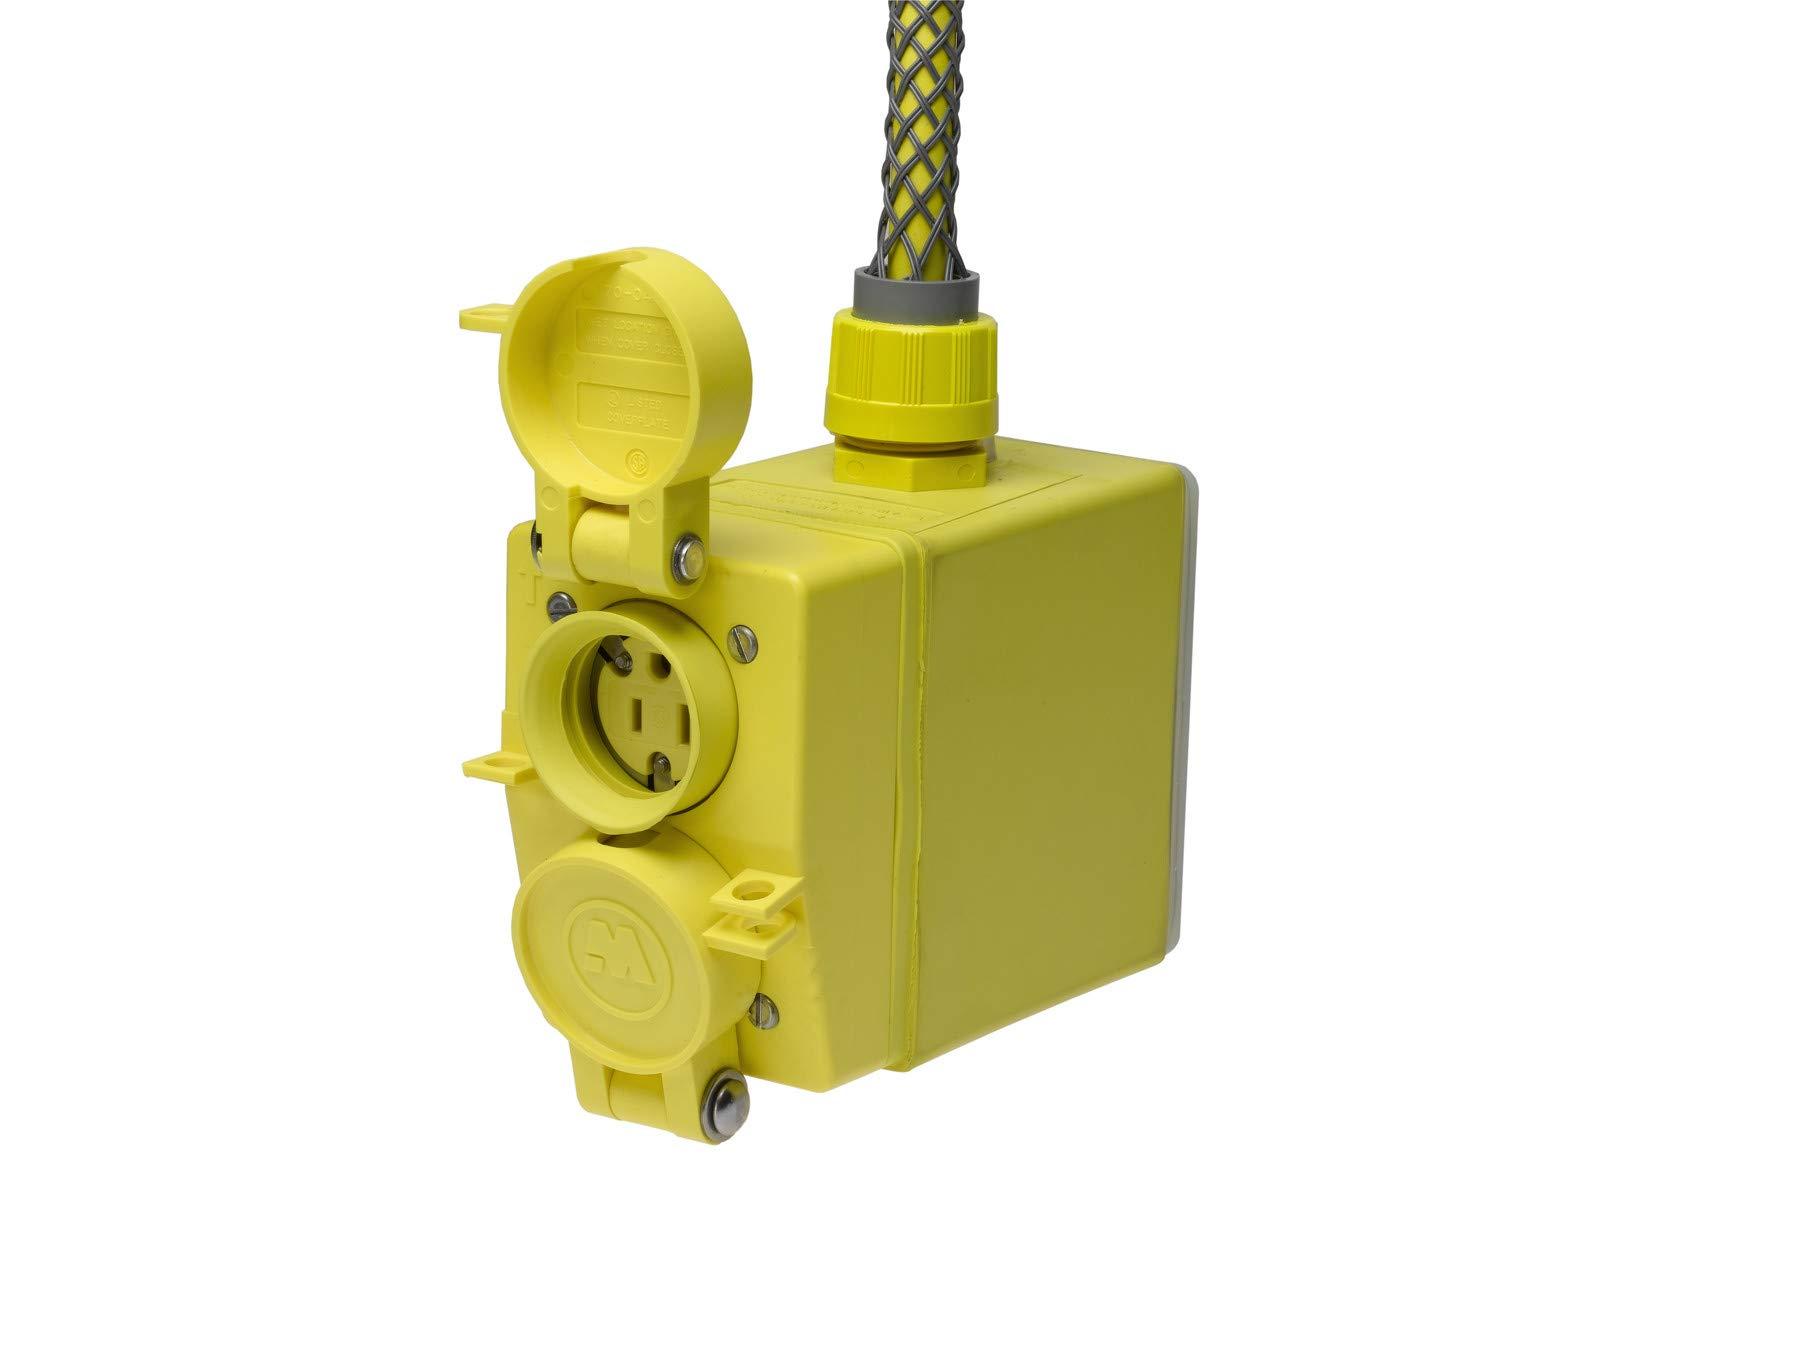 25ft Cord Length Woodhead 3332RA123 Super-Safeway Angled Outlet Box 12//3 SOOW Cord Type NEMA 5-20 Configuration Flip Lid